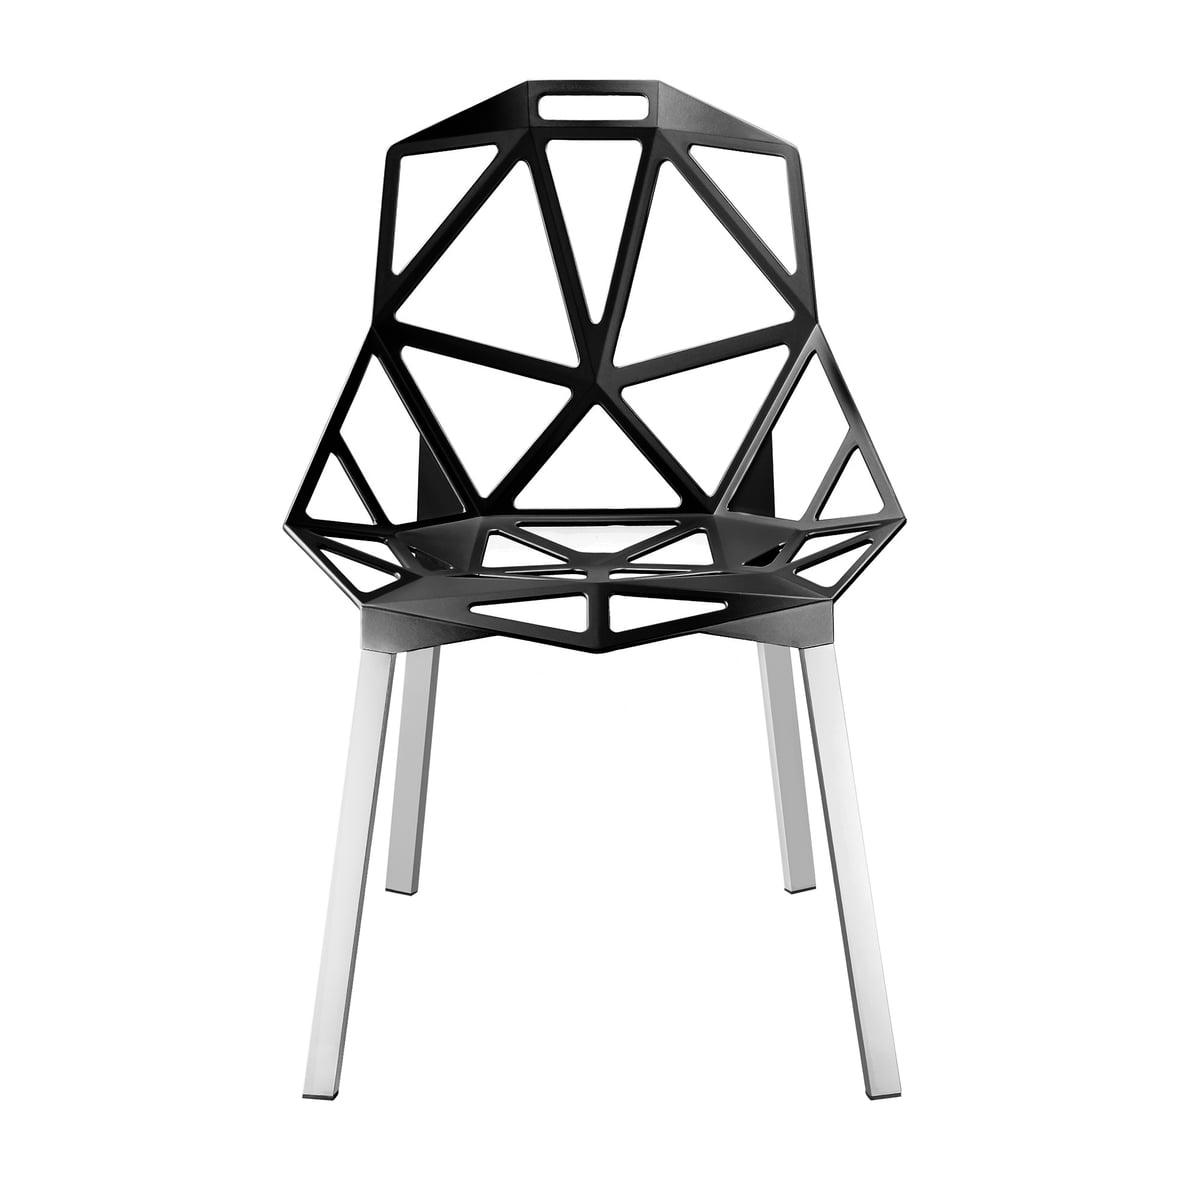 chair one stapelstuhl von magis. Black Bedroom Furniture Sets. Home Design Ideas